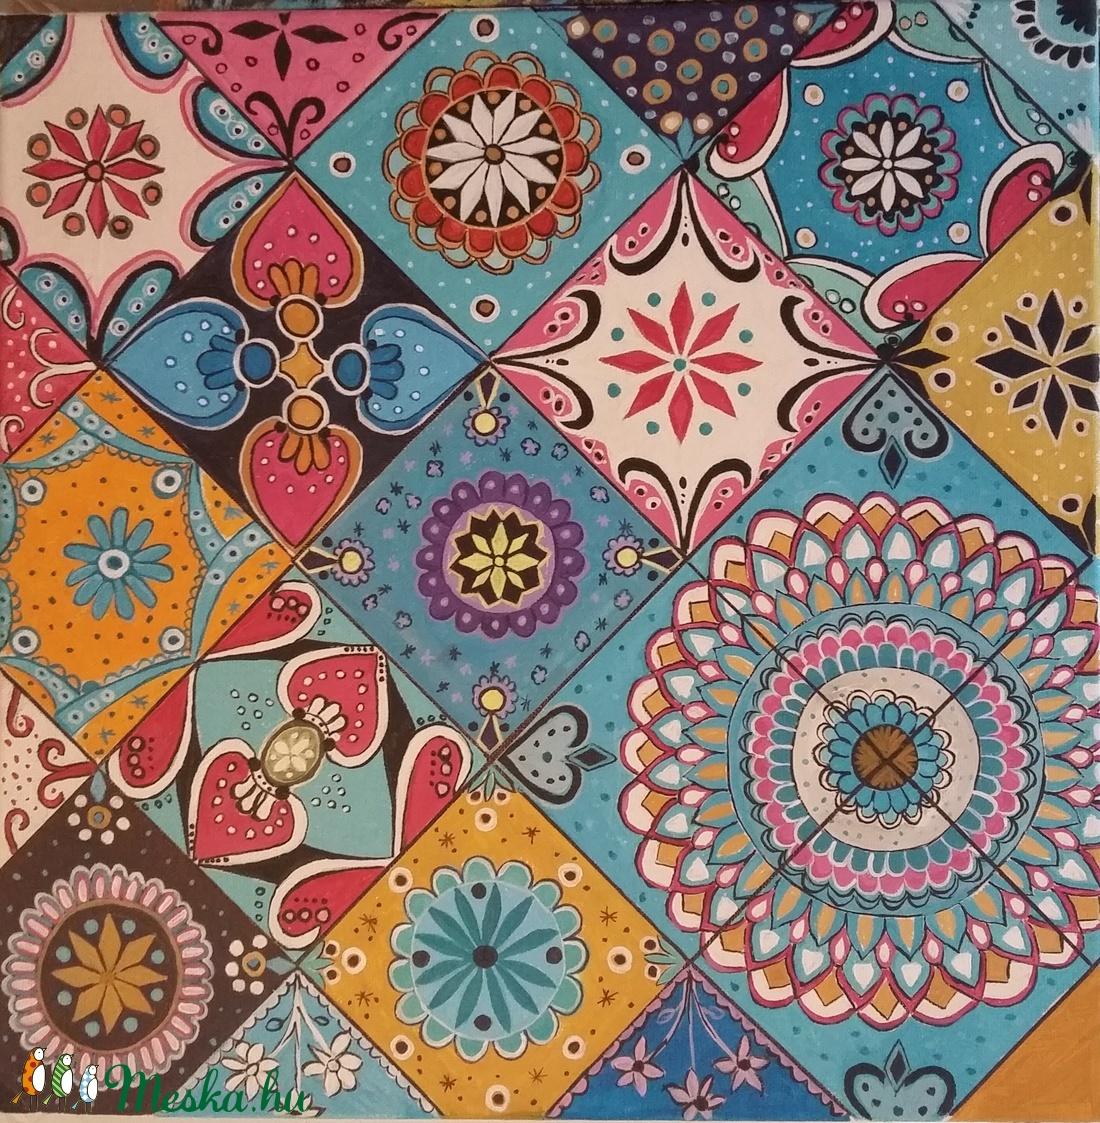 Mozaik kép (memeart) - Meska.hu